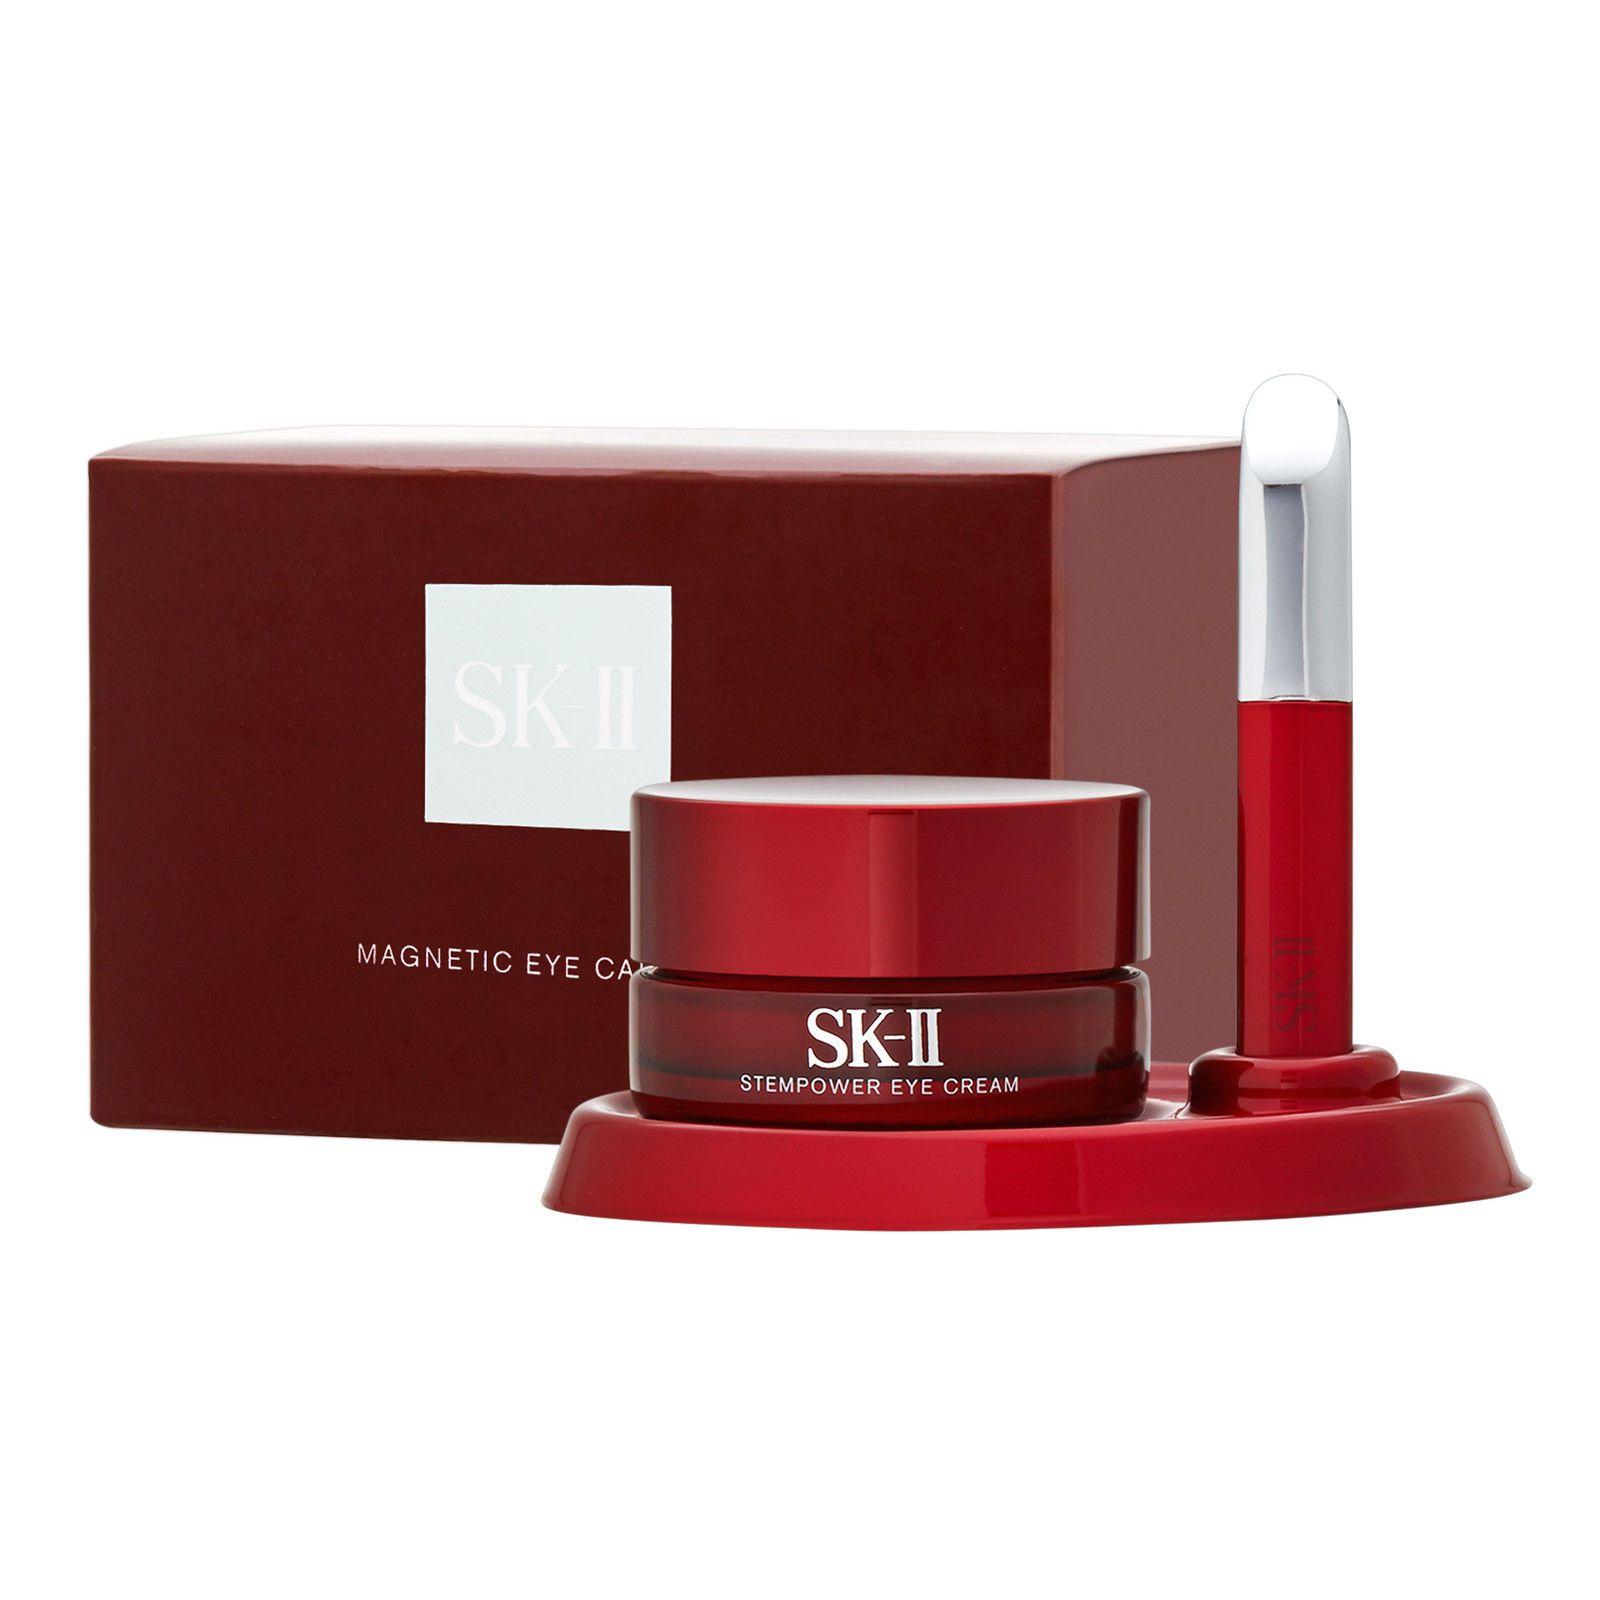 1set 3pcs SK-II Stempower Eye Cream Set (Magnetic Eye Care Kit) NEW Anti Aging